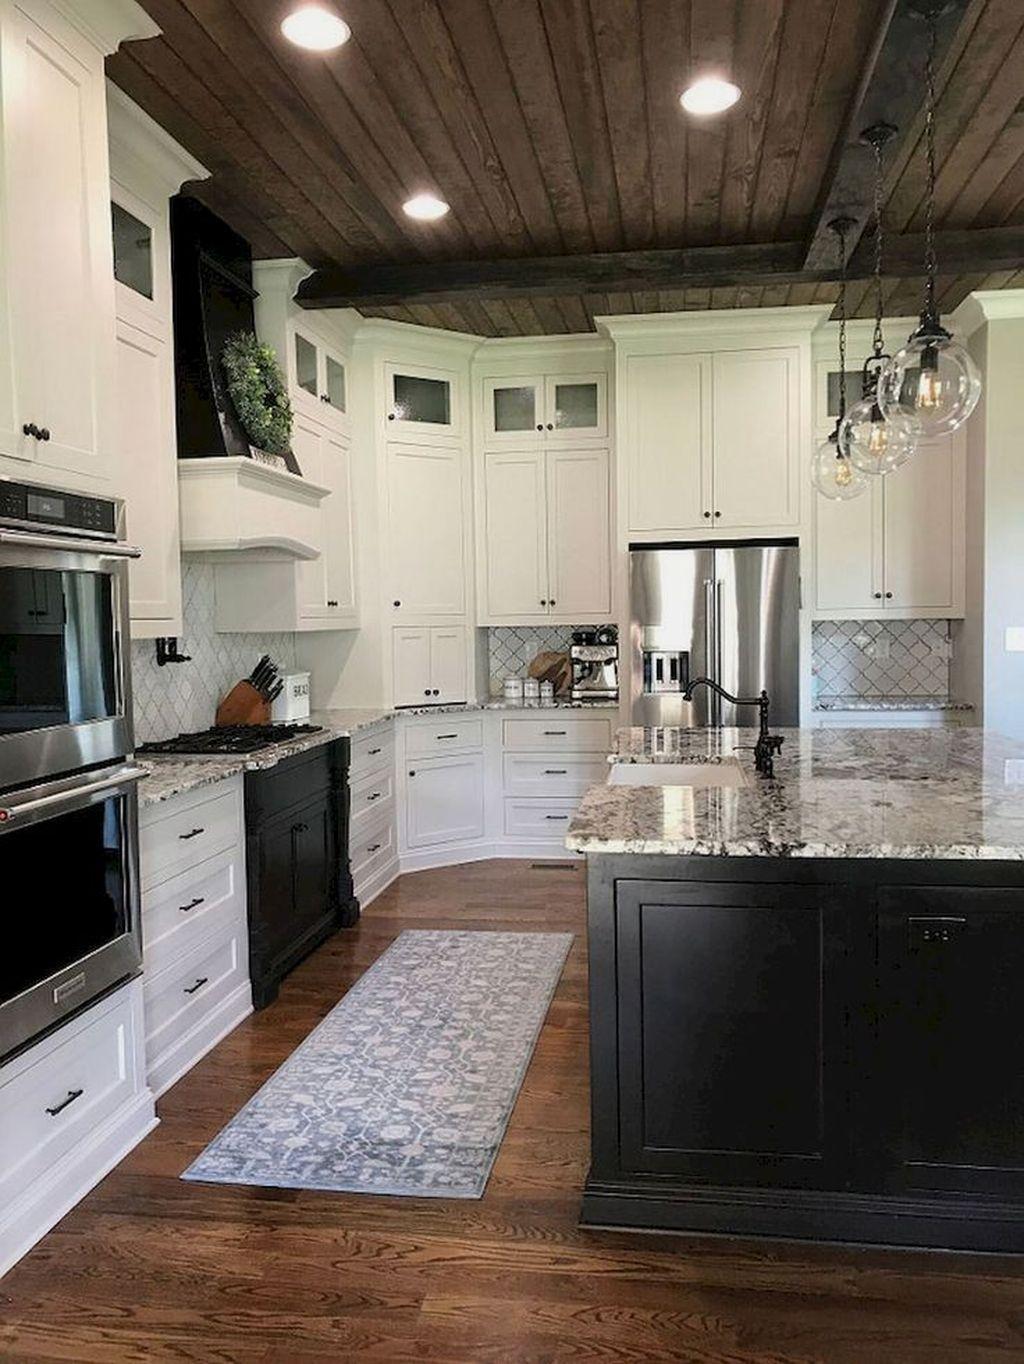 40 Luxury White Kitchen Cabinets Ideas Popy Home Luxury Kitchen Cabinets Luxury Kitchens Tuscan Kitchen